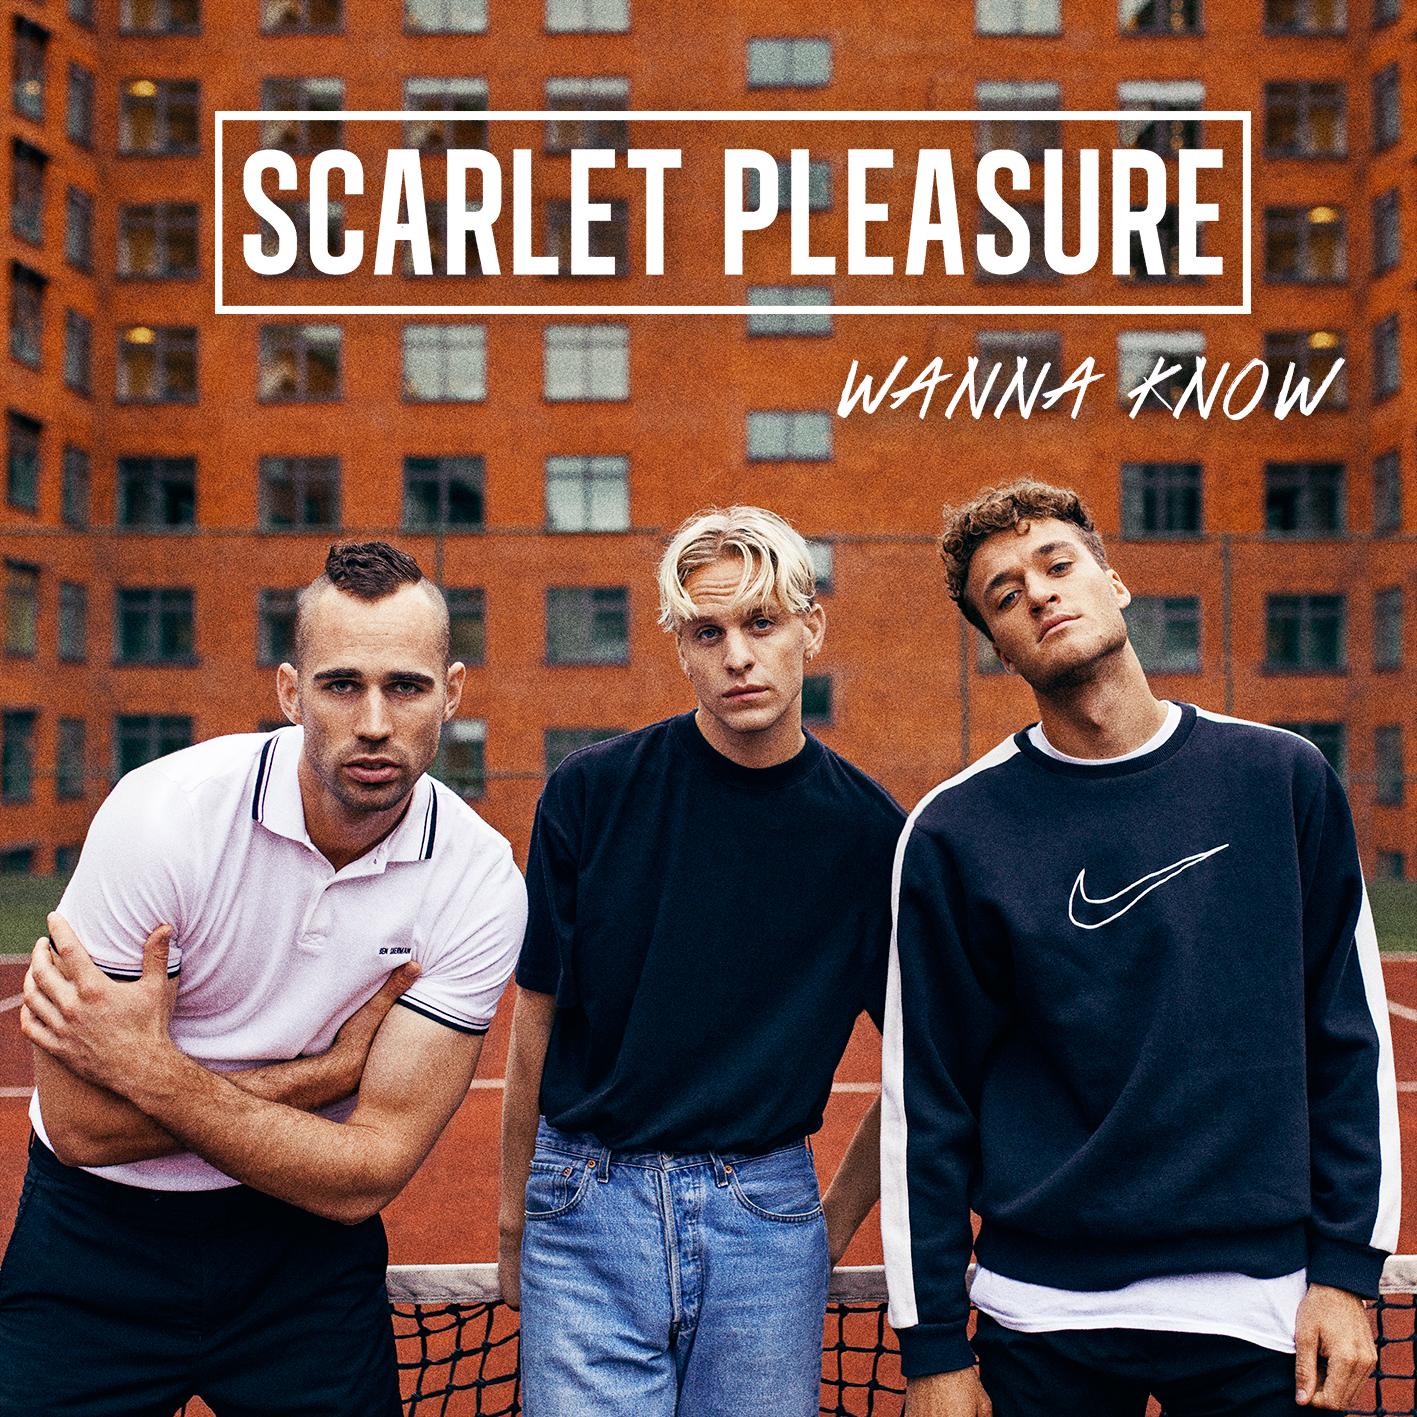 Scarlet+Pleasure+by+photographer+Kia+Hartelius